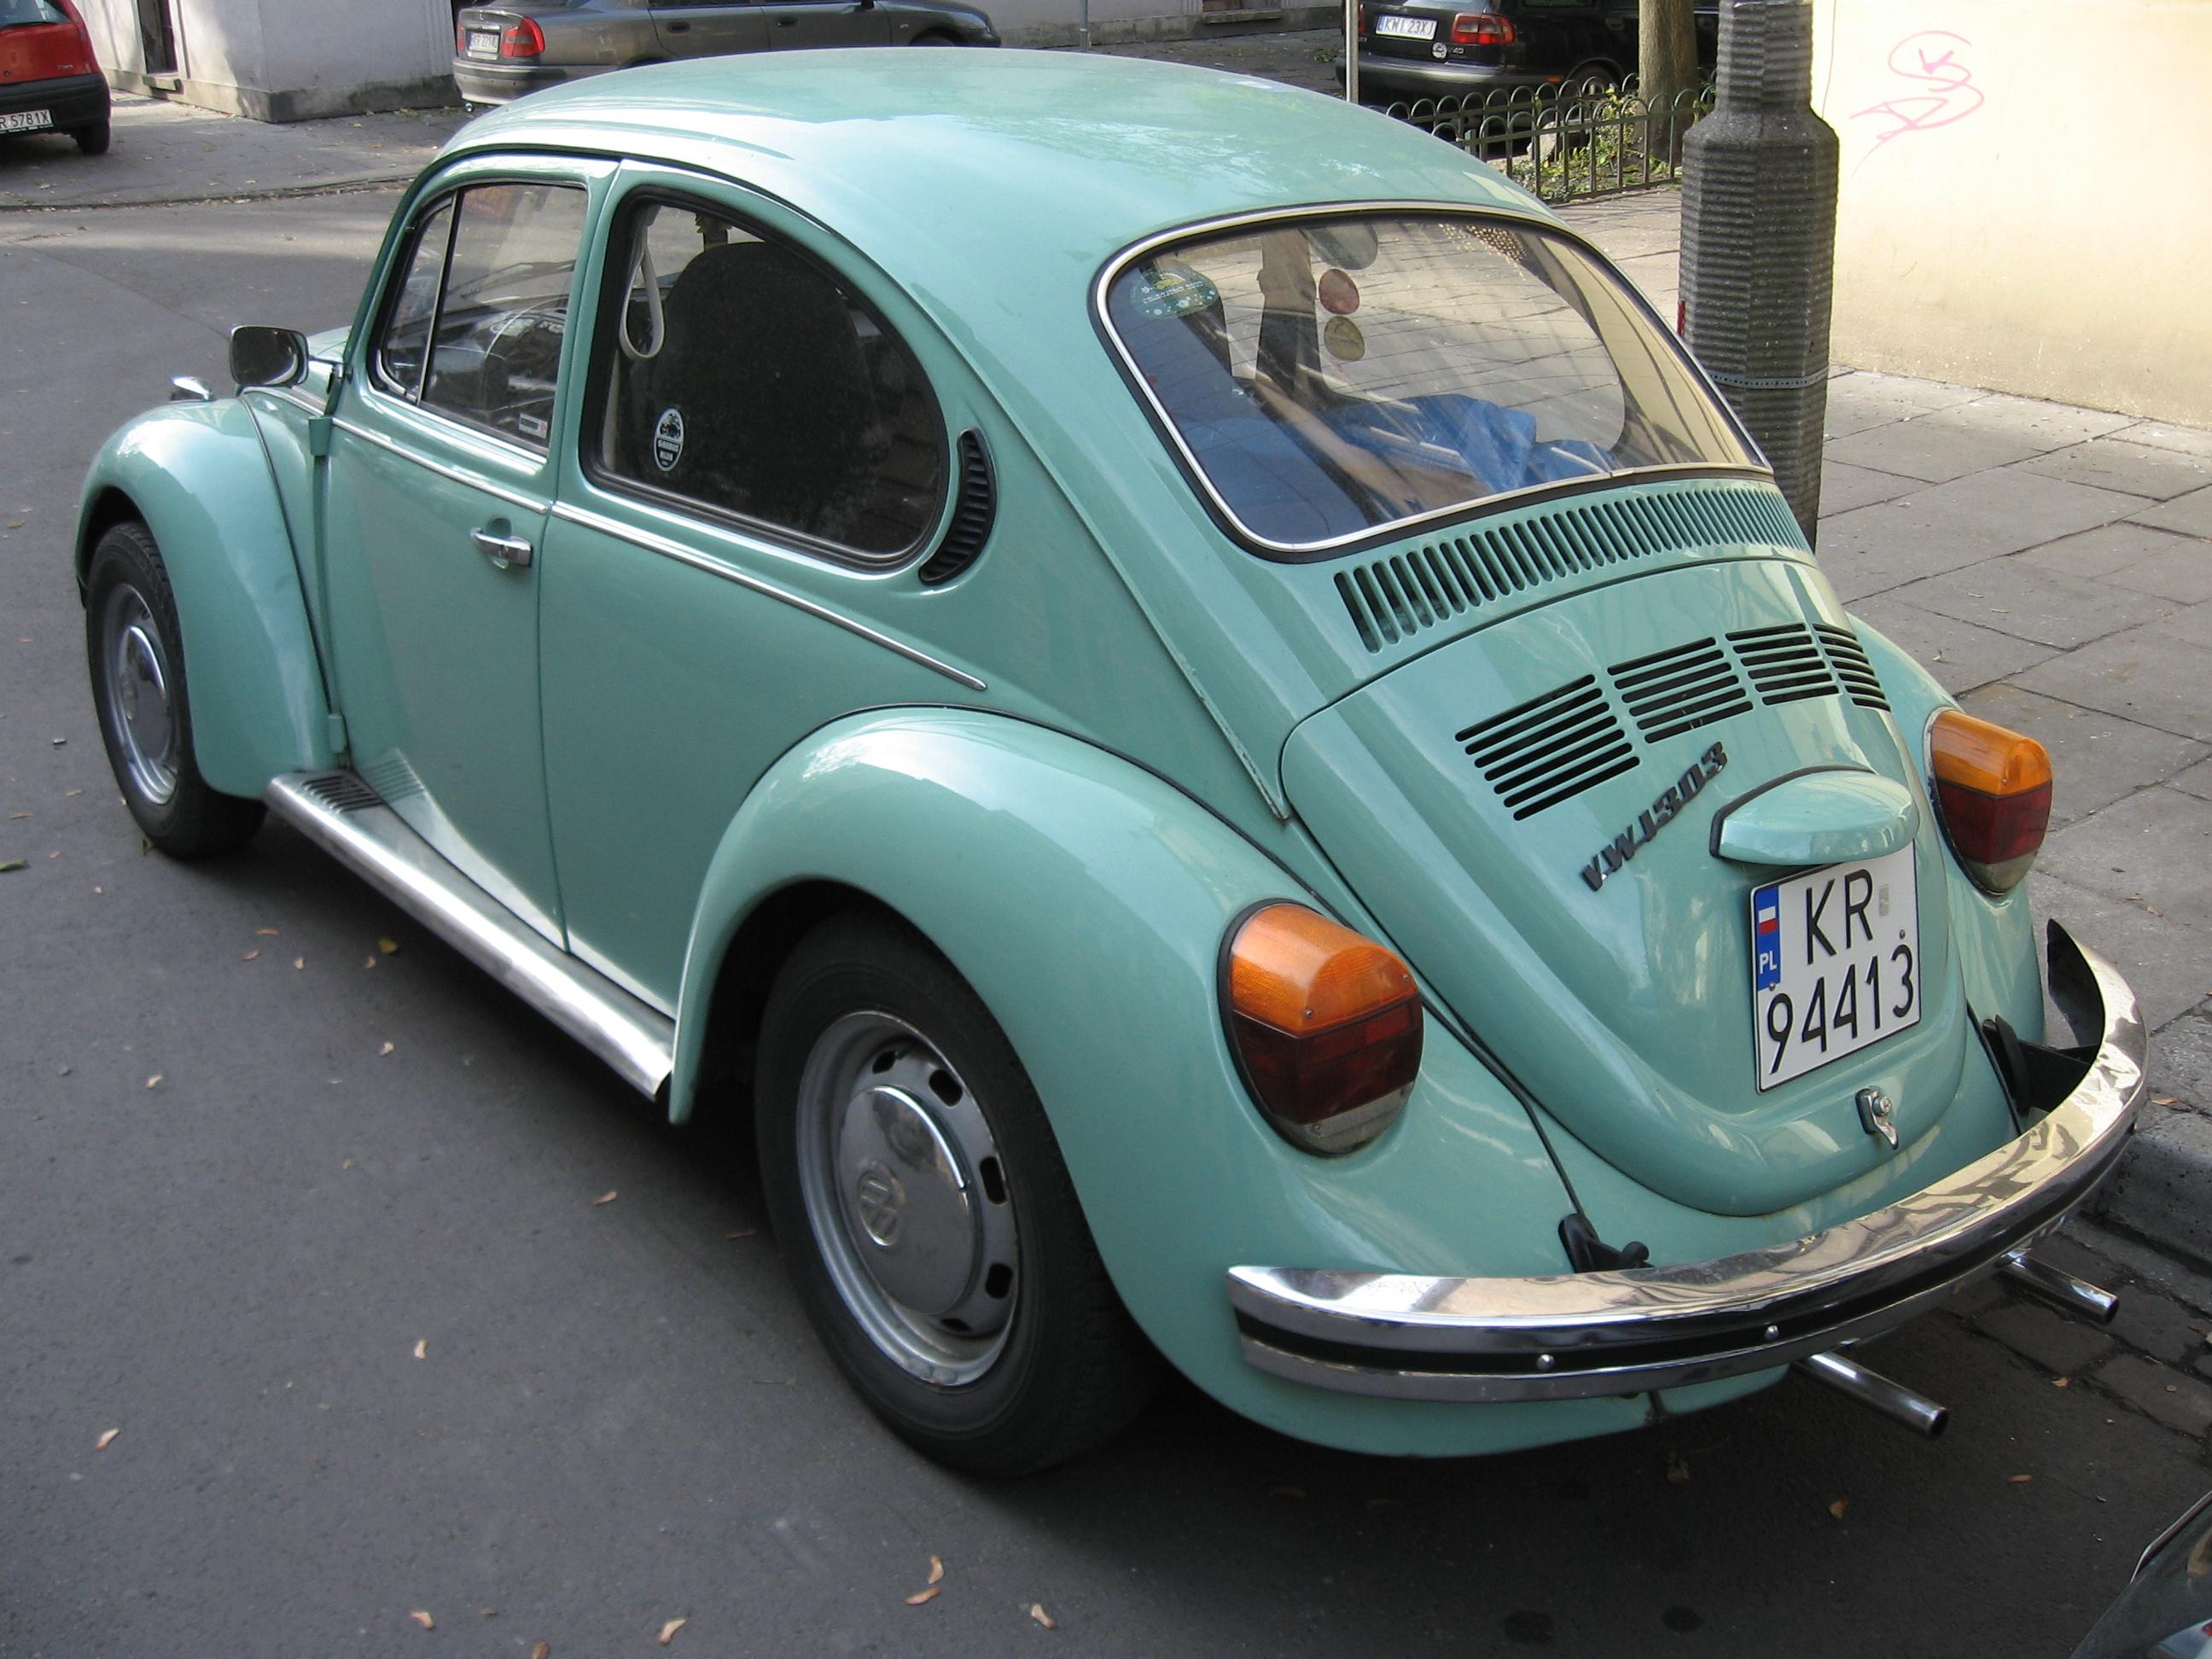 File:Volkswagen 1303 on Piotra Michałkowskiego street in Kraków (1).jpg